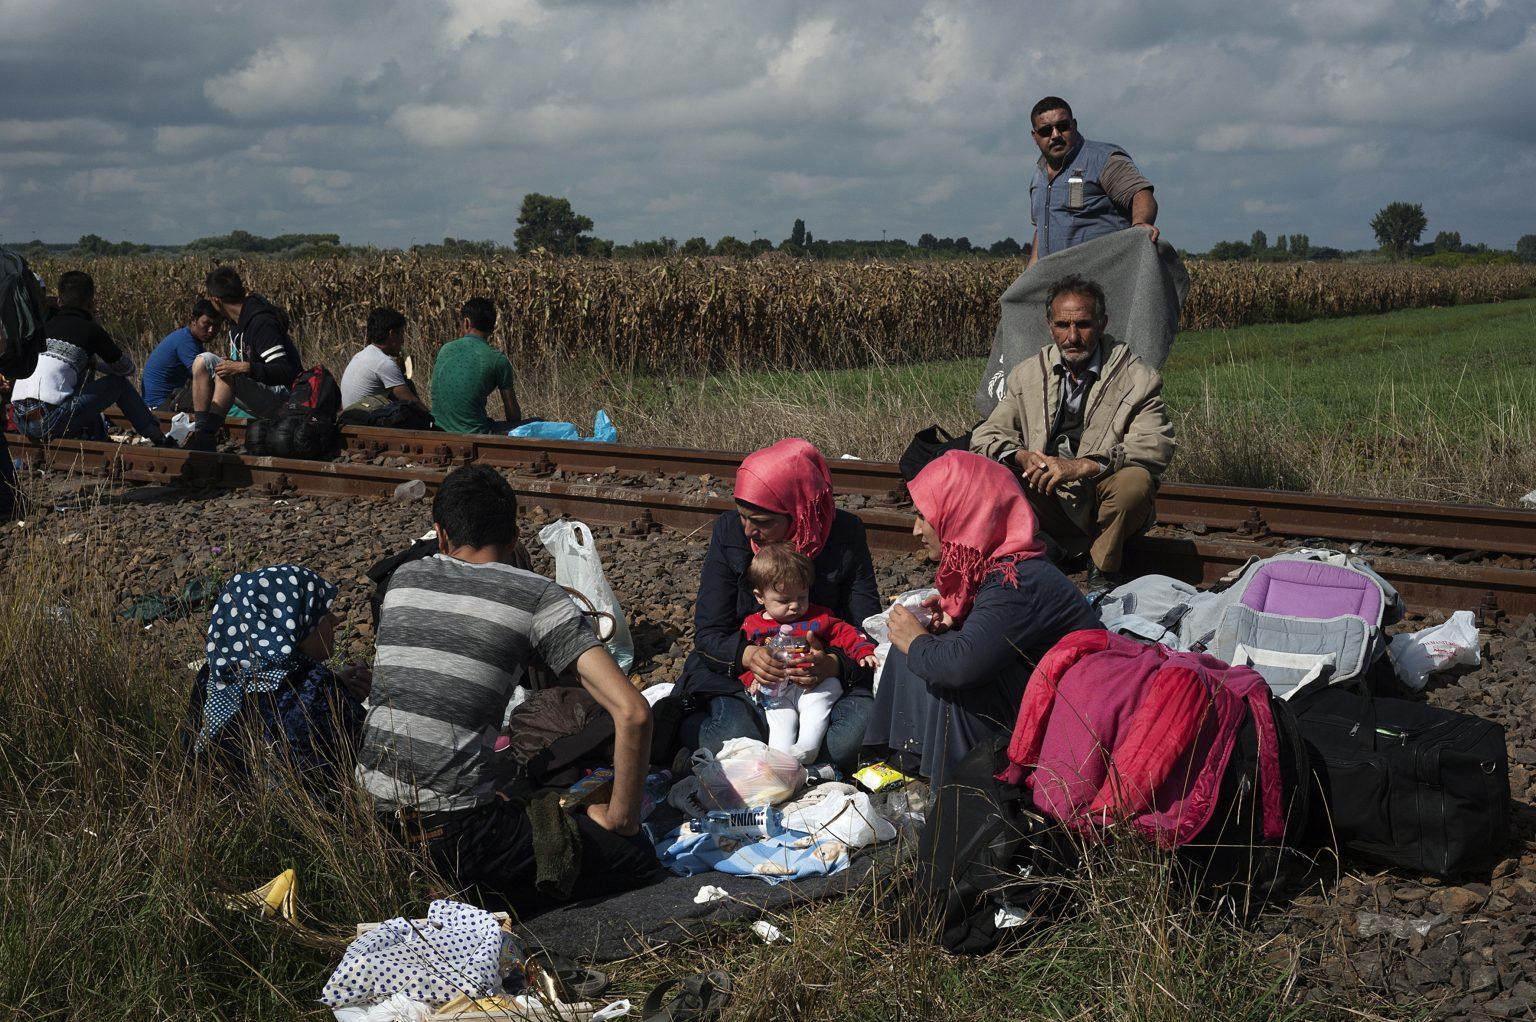 Roszke, Hungary,  September 12th 2015 - Syrian refugees just arriving in the country after crossing the border with Serbia.      ------         The Hungarian government stated within September 15th the border definitively will be closed, in order to stop the flux of refugees coming from Serbia. According to surveys, during the day of September the 12th more than 4,000 people crossed the border between the two countries.    ><      Röszke, Ungheria, 12 settembre 2015 - Profughi siriani appena arrivati in Ungheria dopo aver passato il confine con la Serbia.             -------------              Il governo ungherese ha dichiarato che entro il 15 settembre il confine sarà definitivamente chiuso per interrompere il flusso di immigrati provenienti dalla Serbia. Secondo le stime, solo nel giorno 12 di settembre più di 4.000 persone hanno attraversato il confine tra le due nazioni.   *** Local Caption *** 00557253